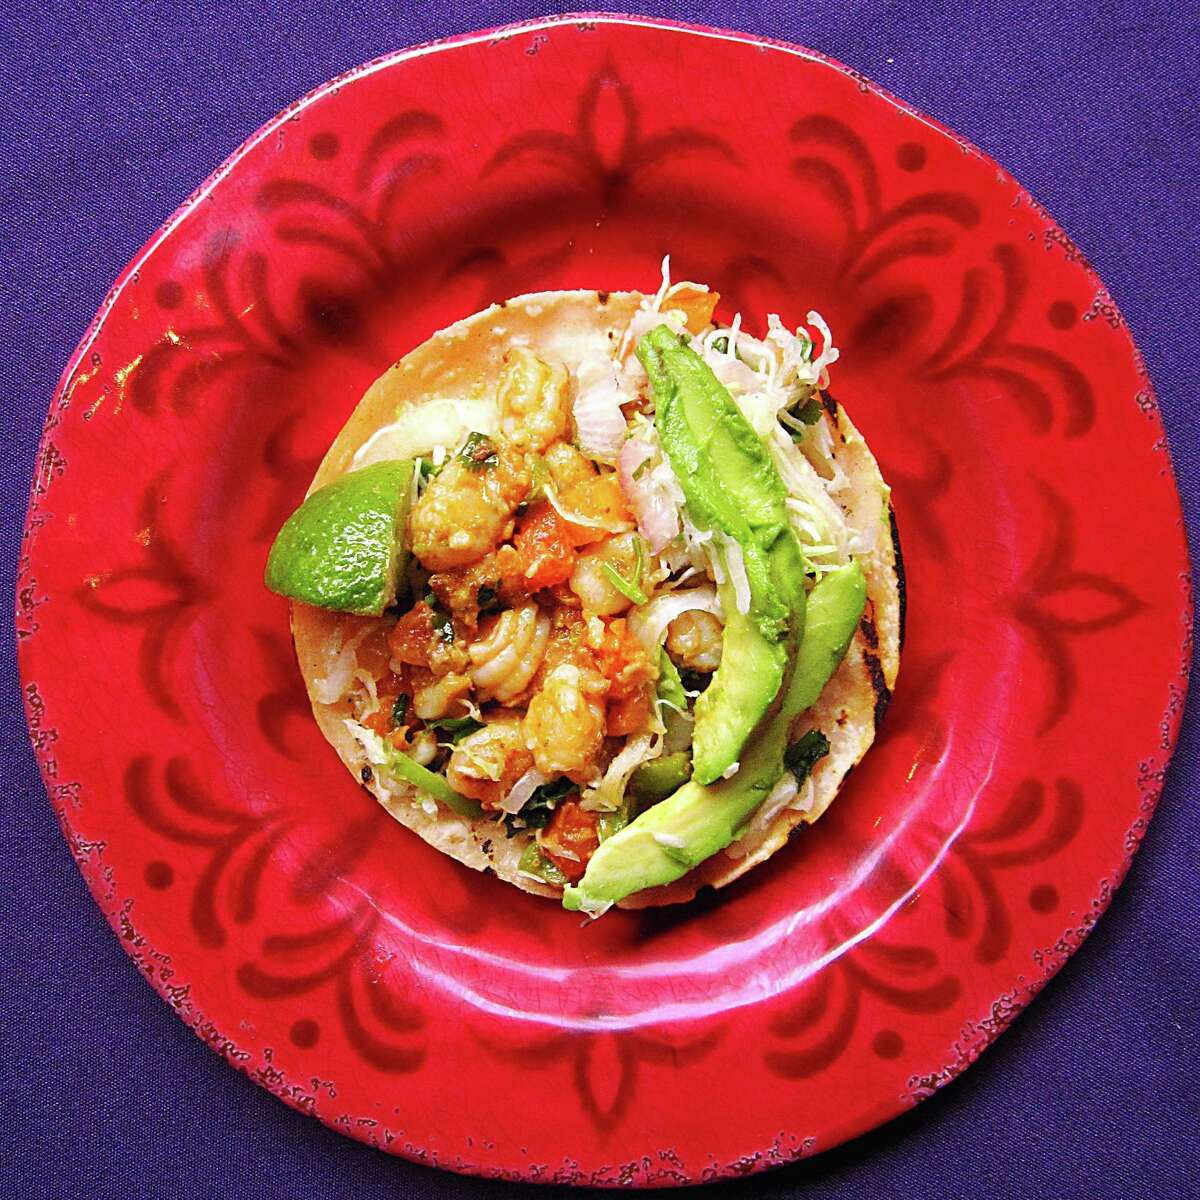 Shrimp taco on a handmade corn tortilla from Ácenar.